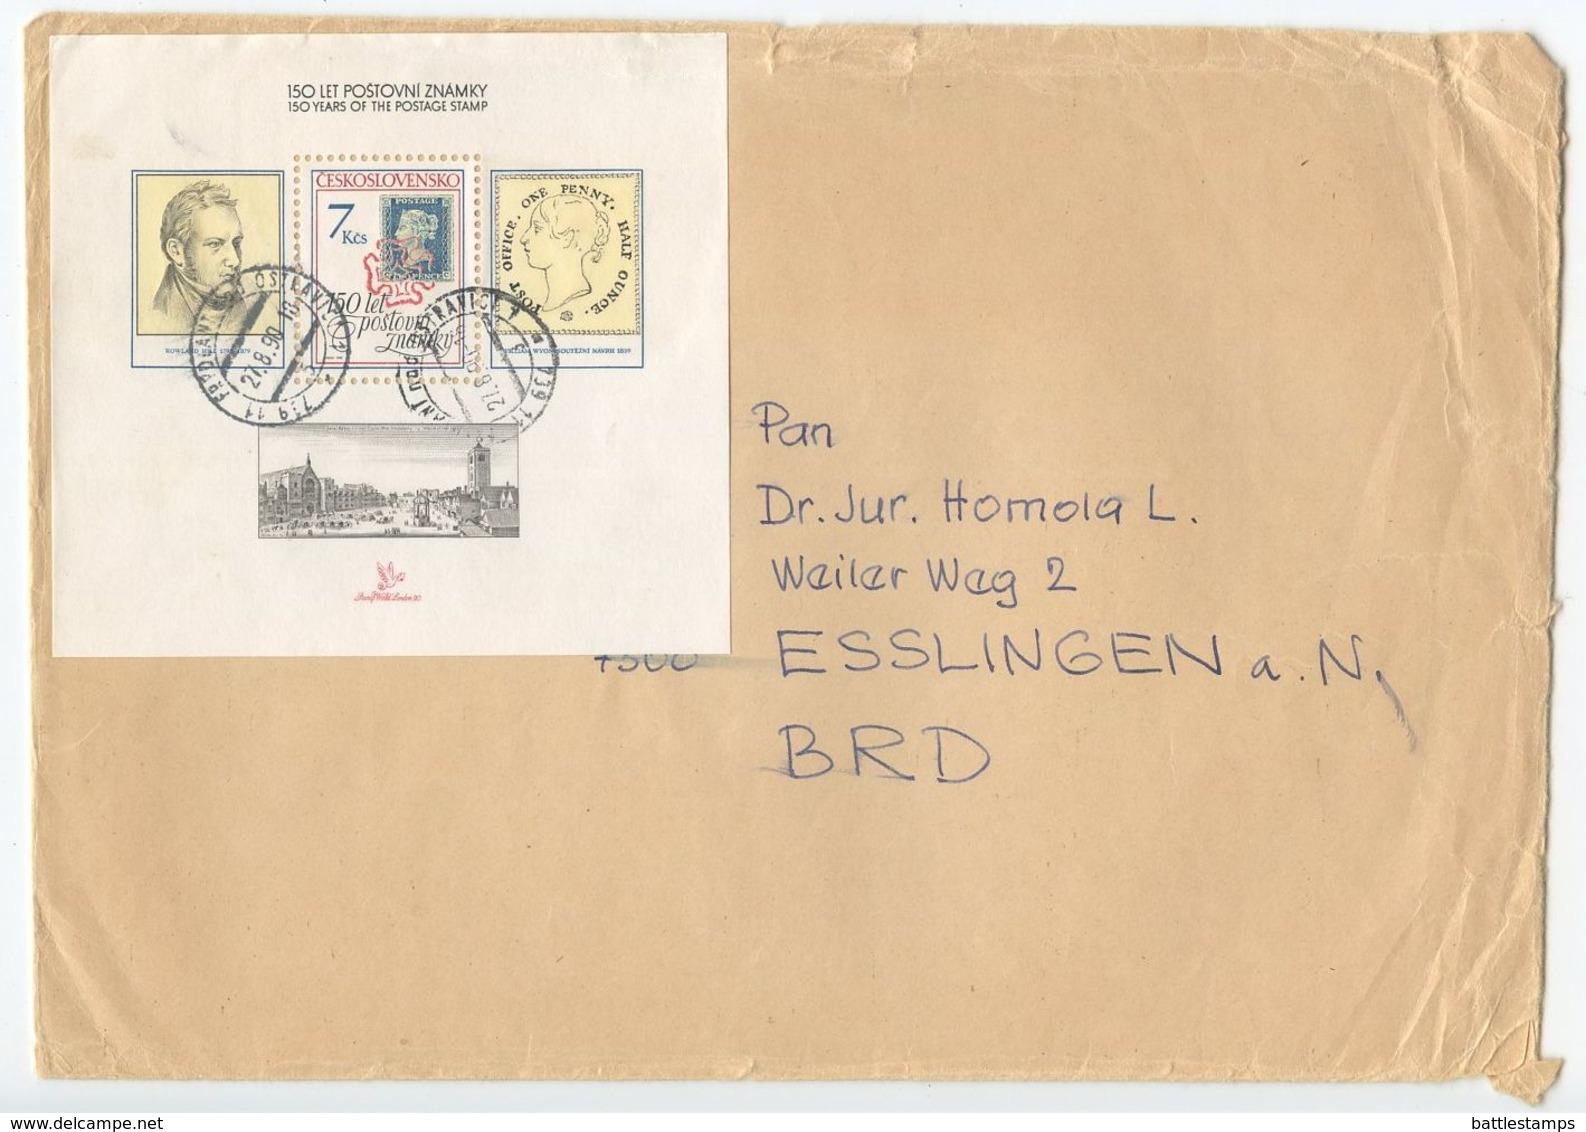 Czechoslovakia 1990 Cover Frýdlant Nad Ostravicí To Germany, Scott 2789 London Show S/S - Covers & Documents